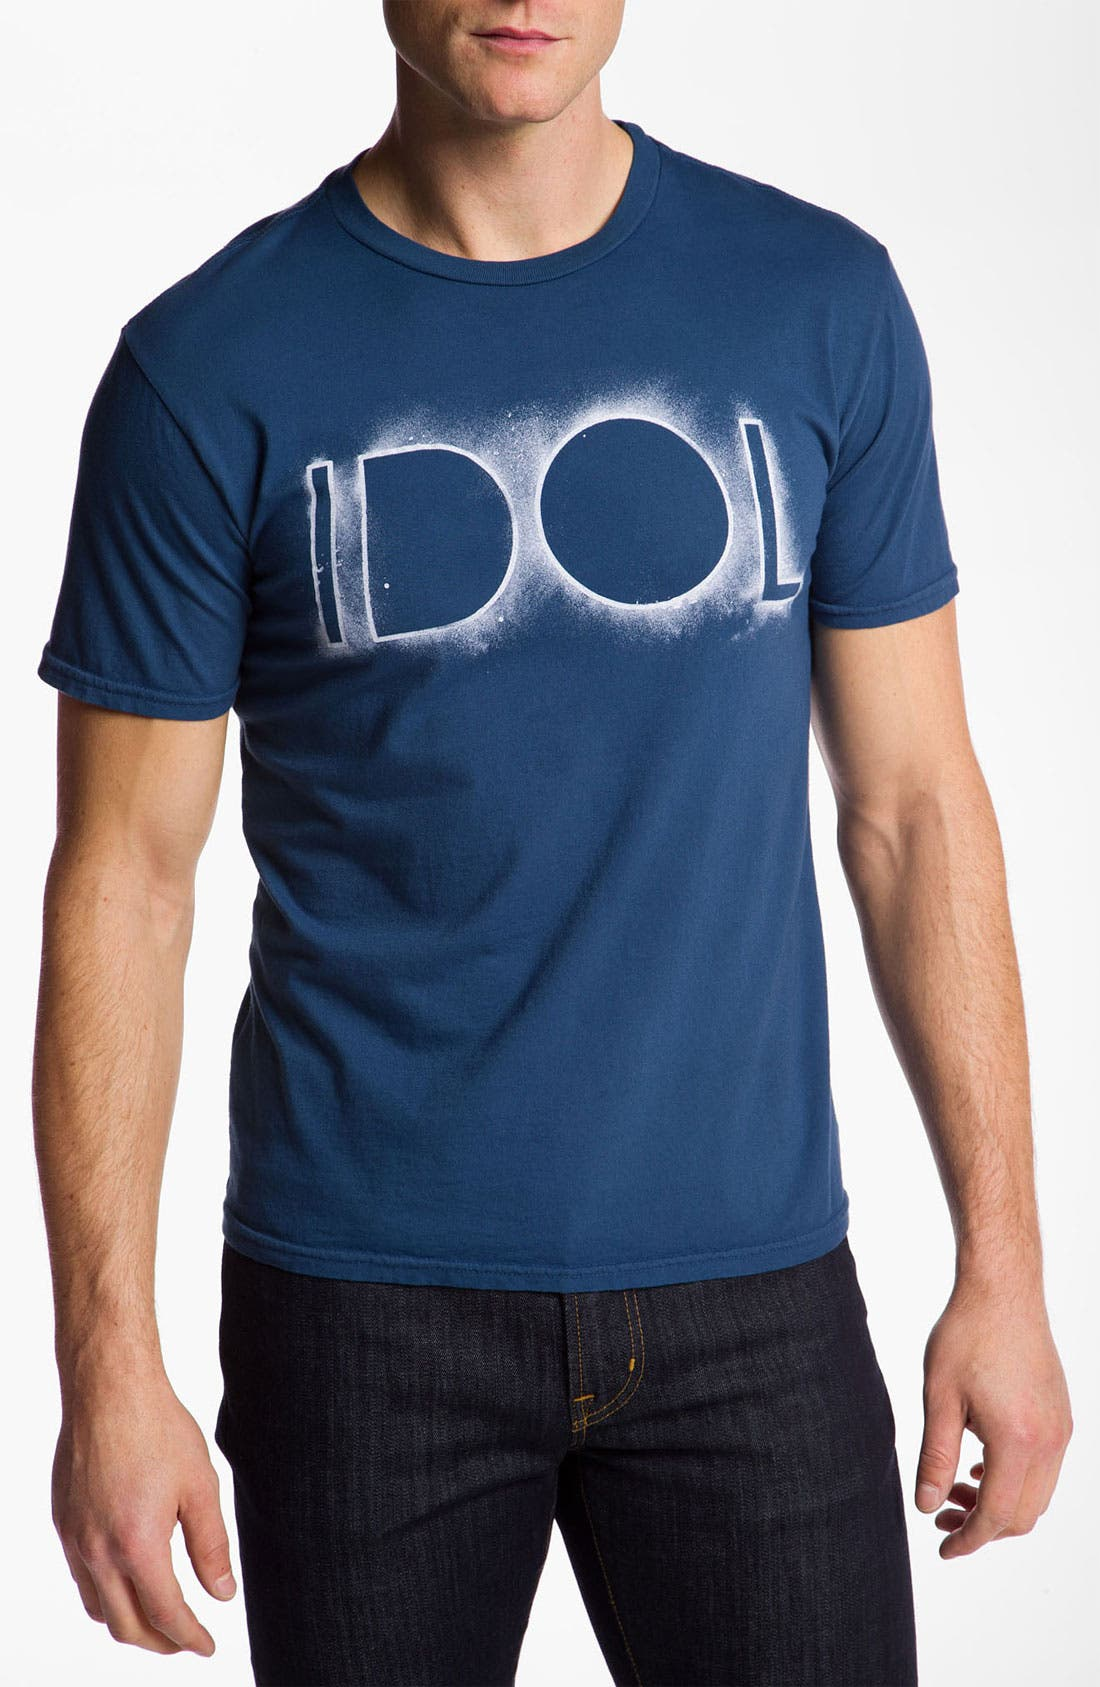 Main Image - Chaser 'Idol' T-Shirt